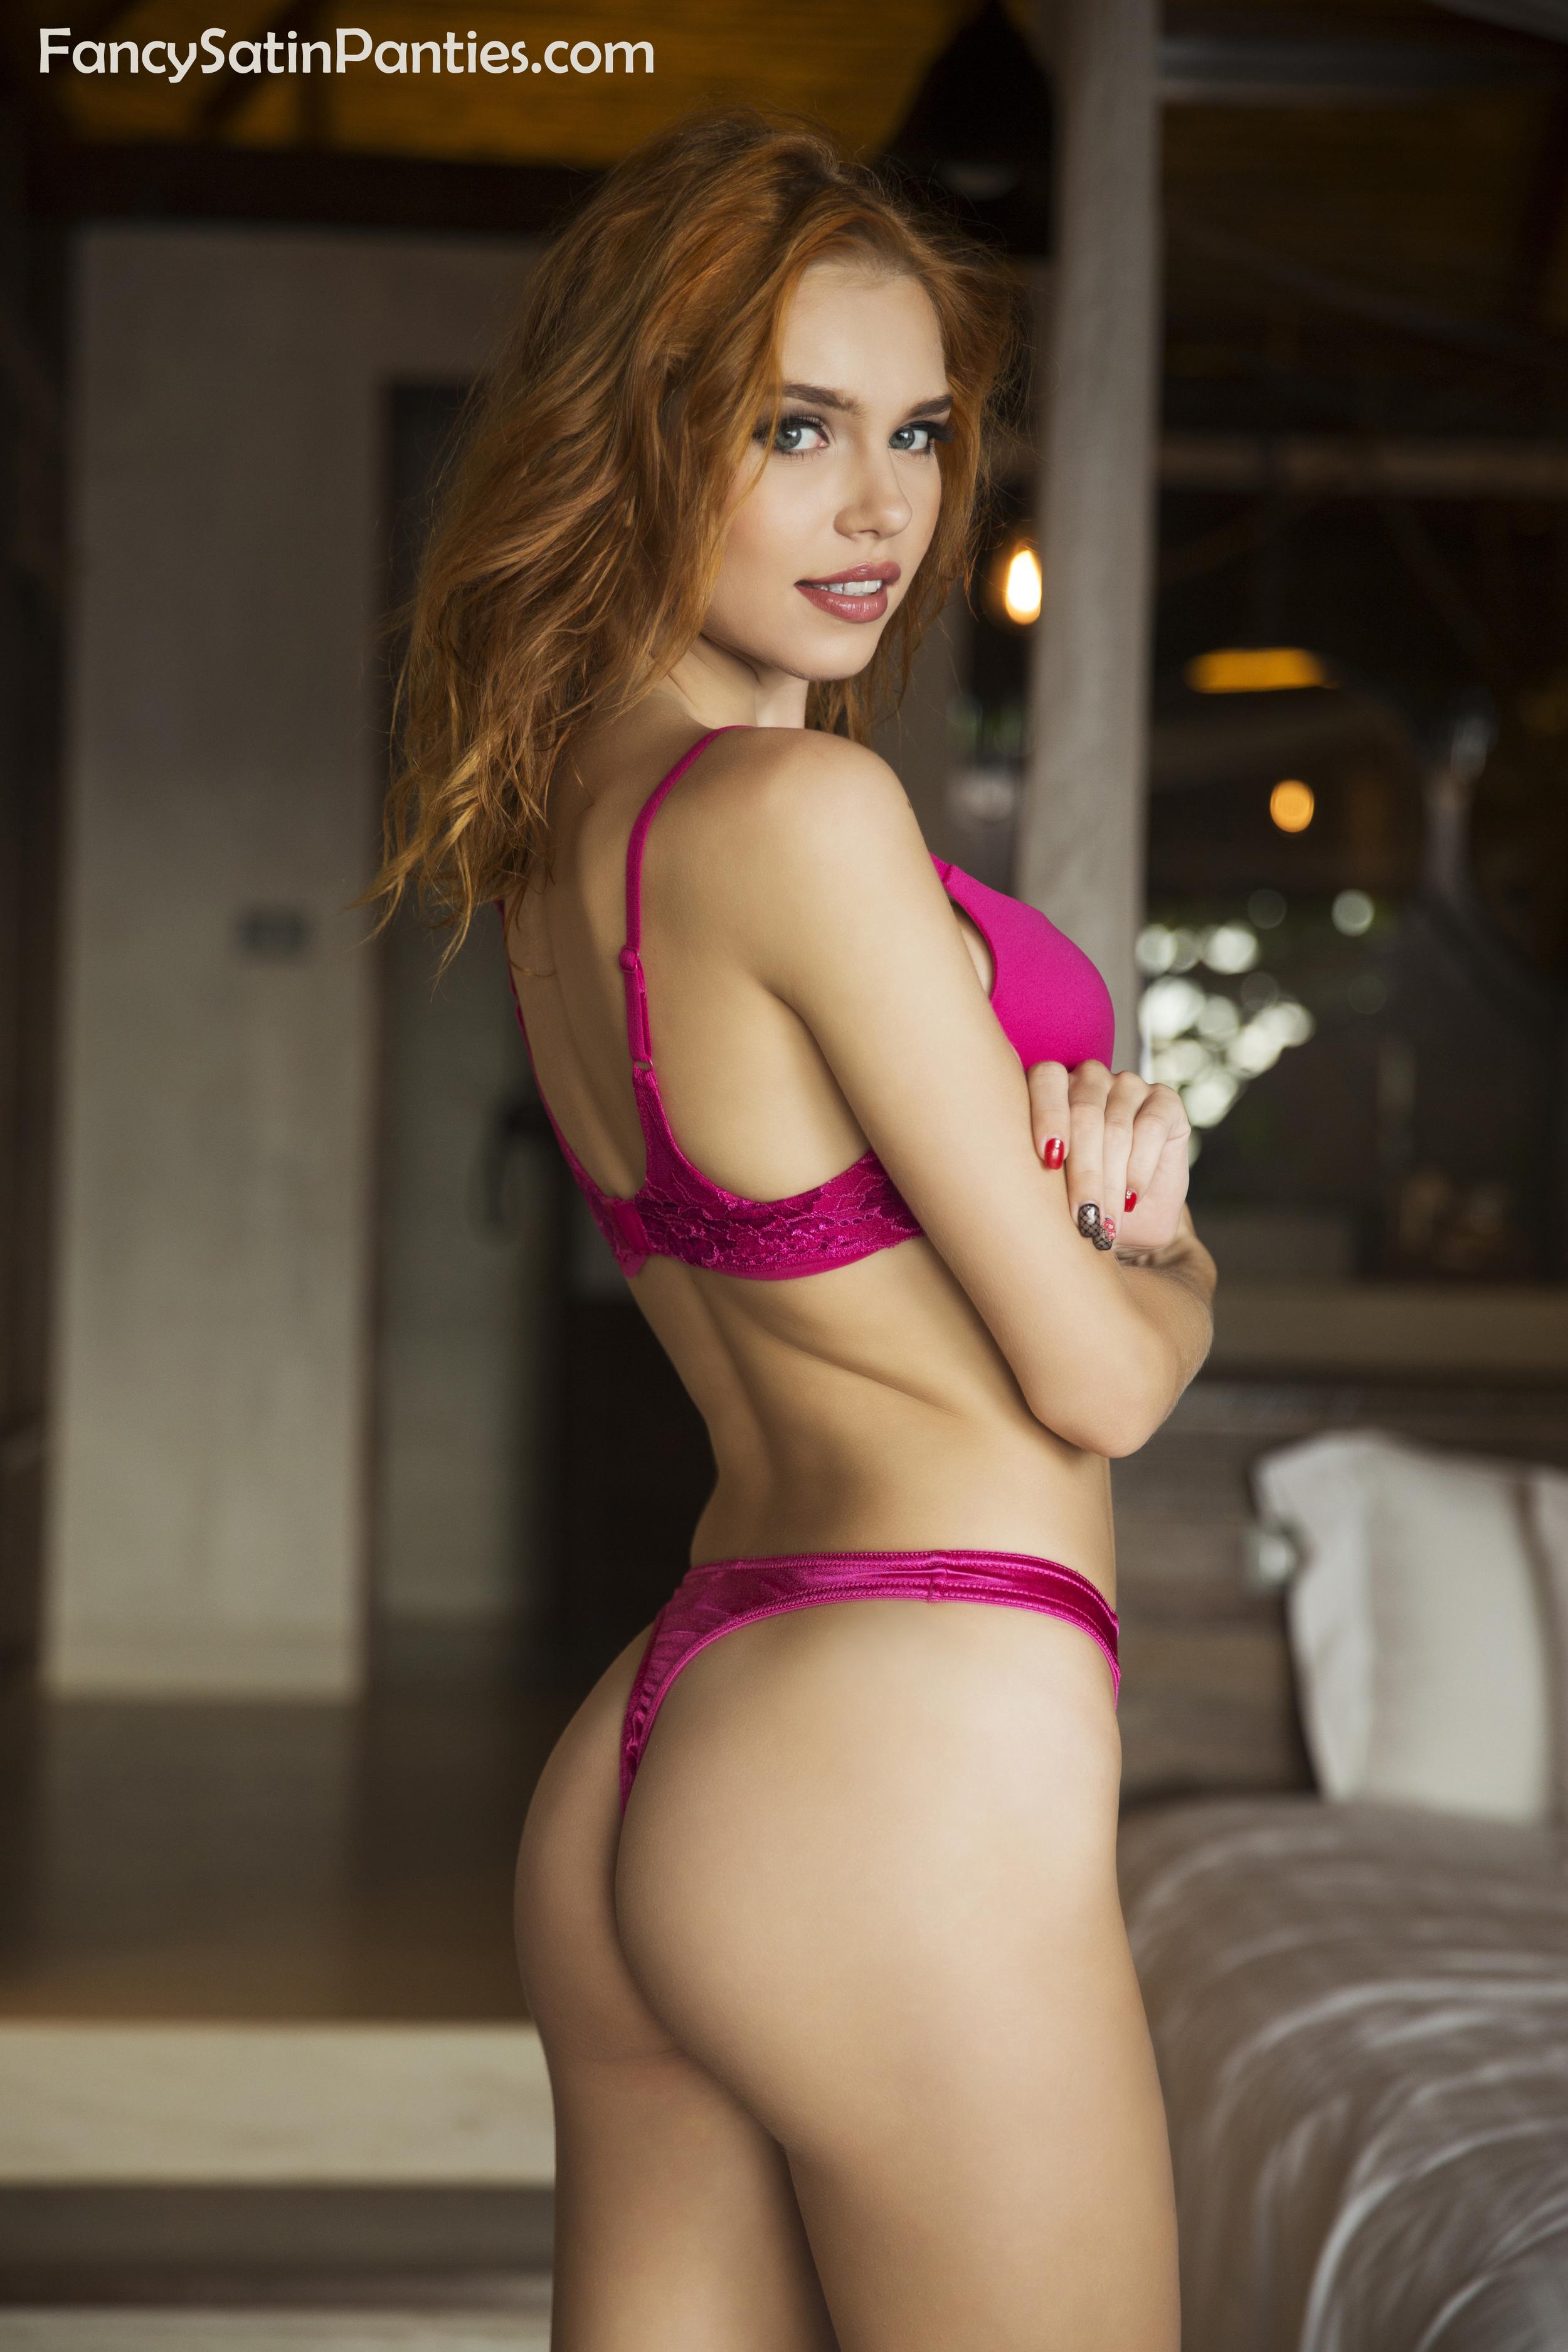 fancy satin panty thong pink 2sitename.jpg